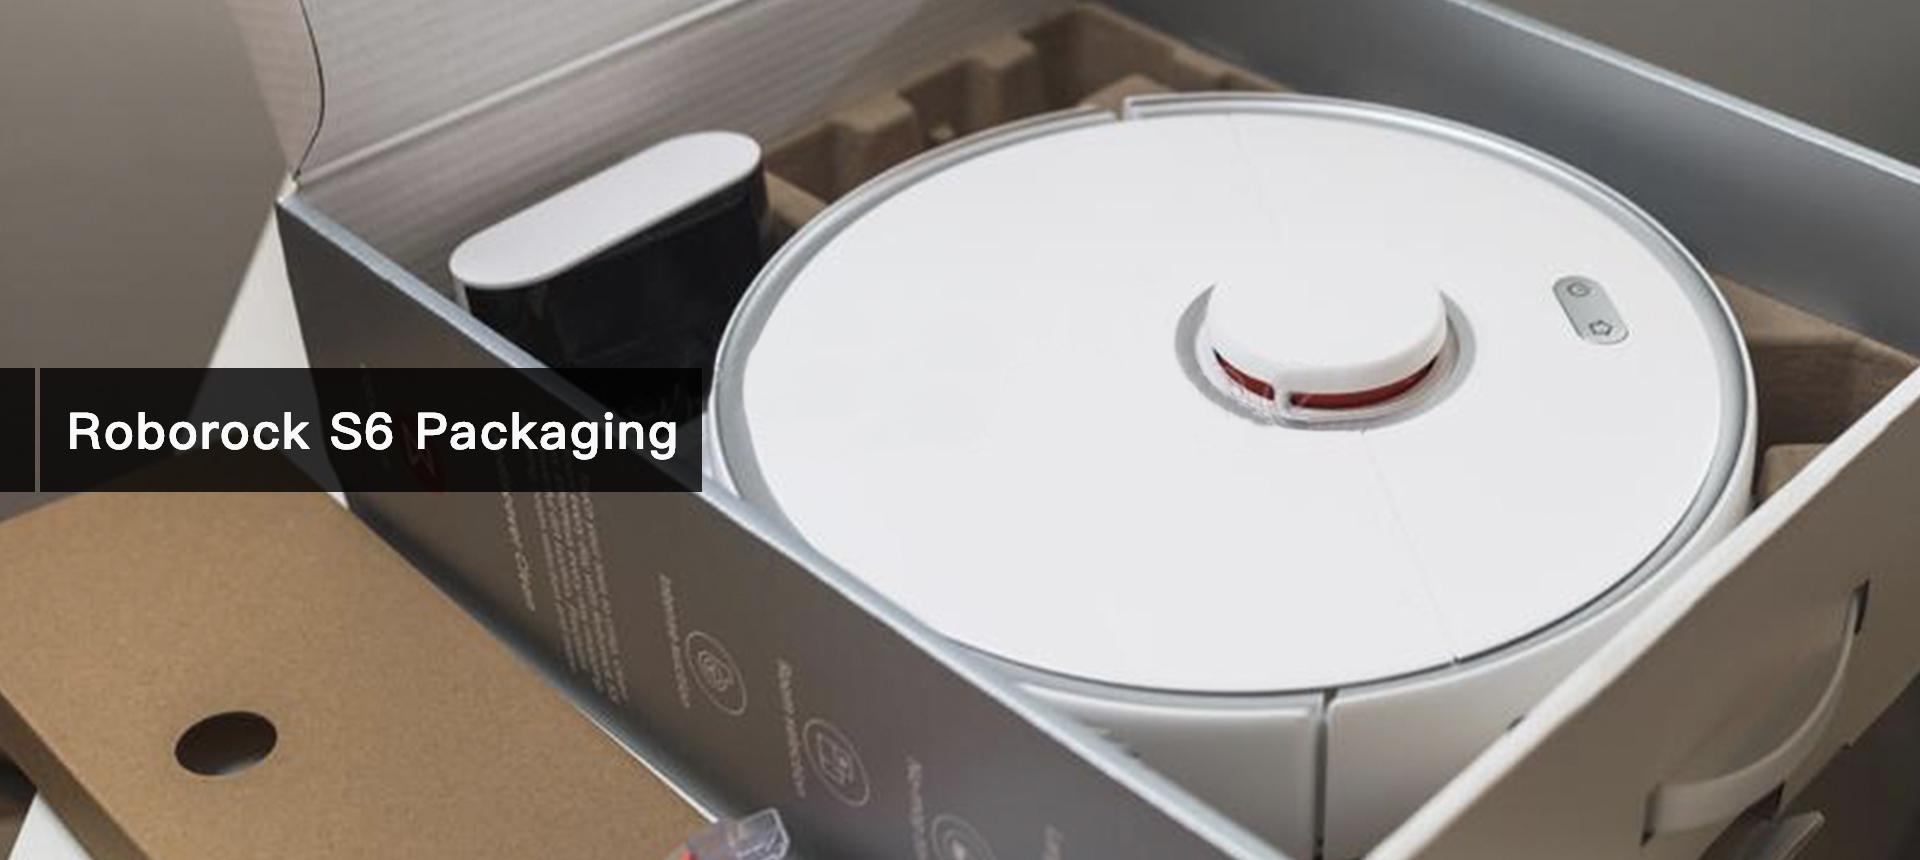 Roborock S6 Packaging